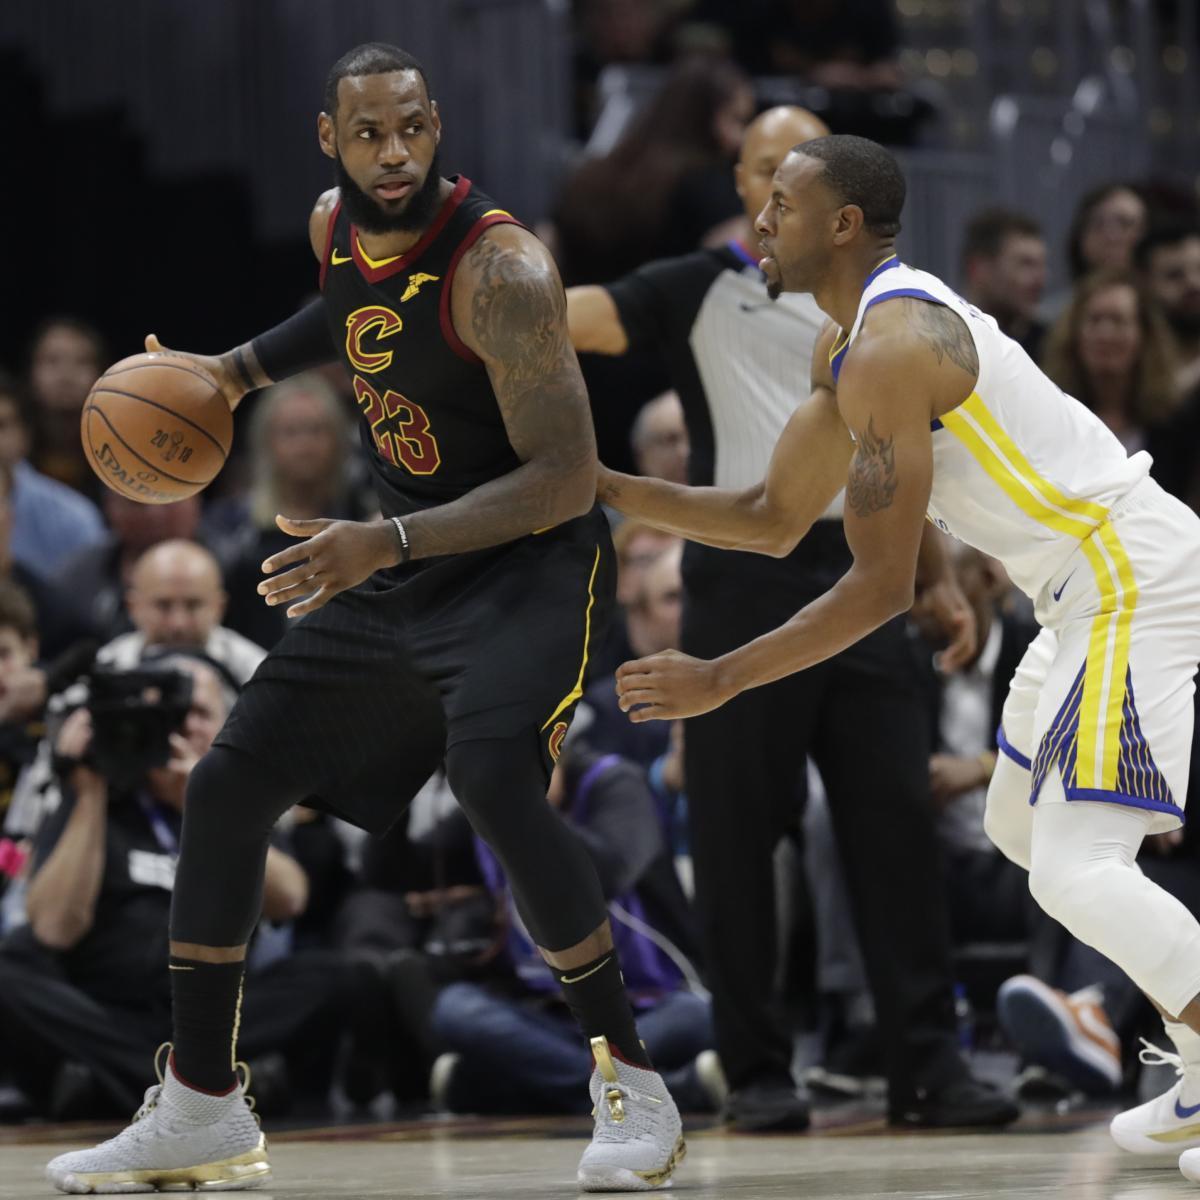 Lakers' LeBron James Says Andre Iguodala's 'Championship DNA' Makes Heat Better